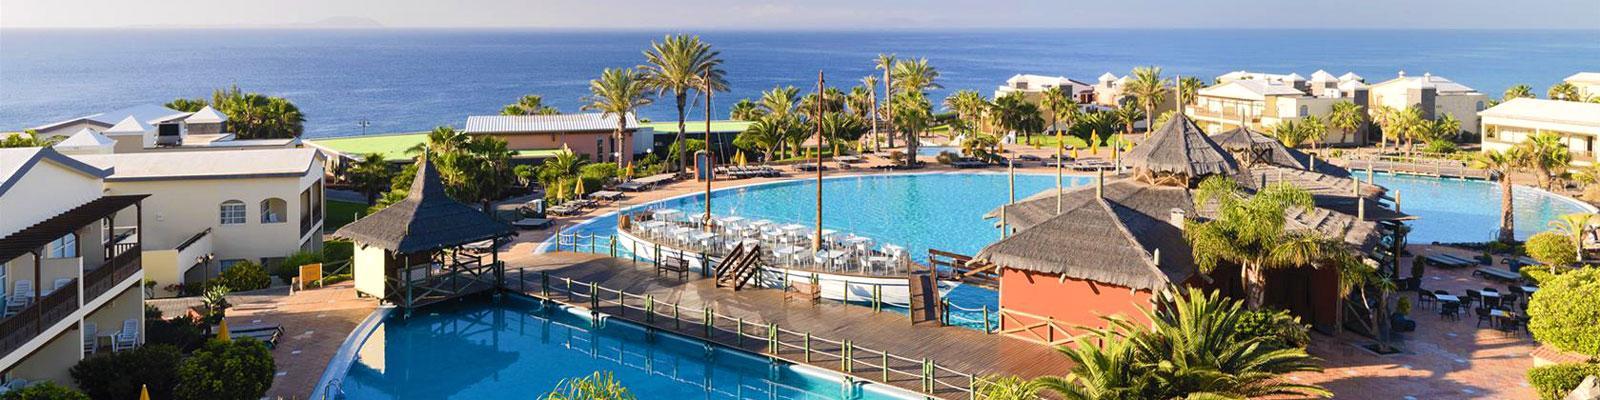 H10 Rubicon Palace - Hotel per famiglie a Lanzarote